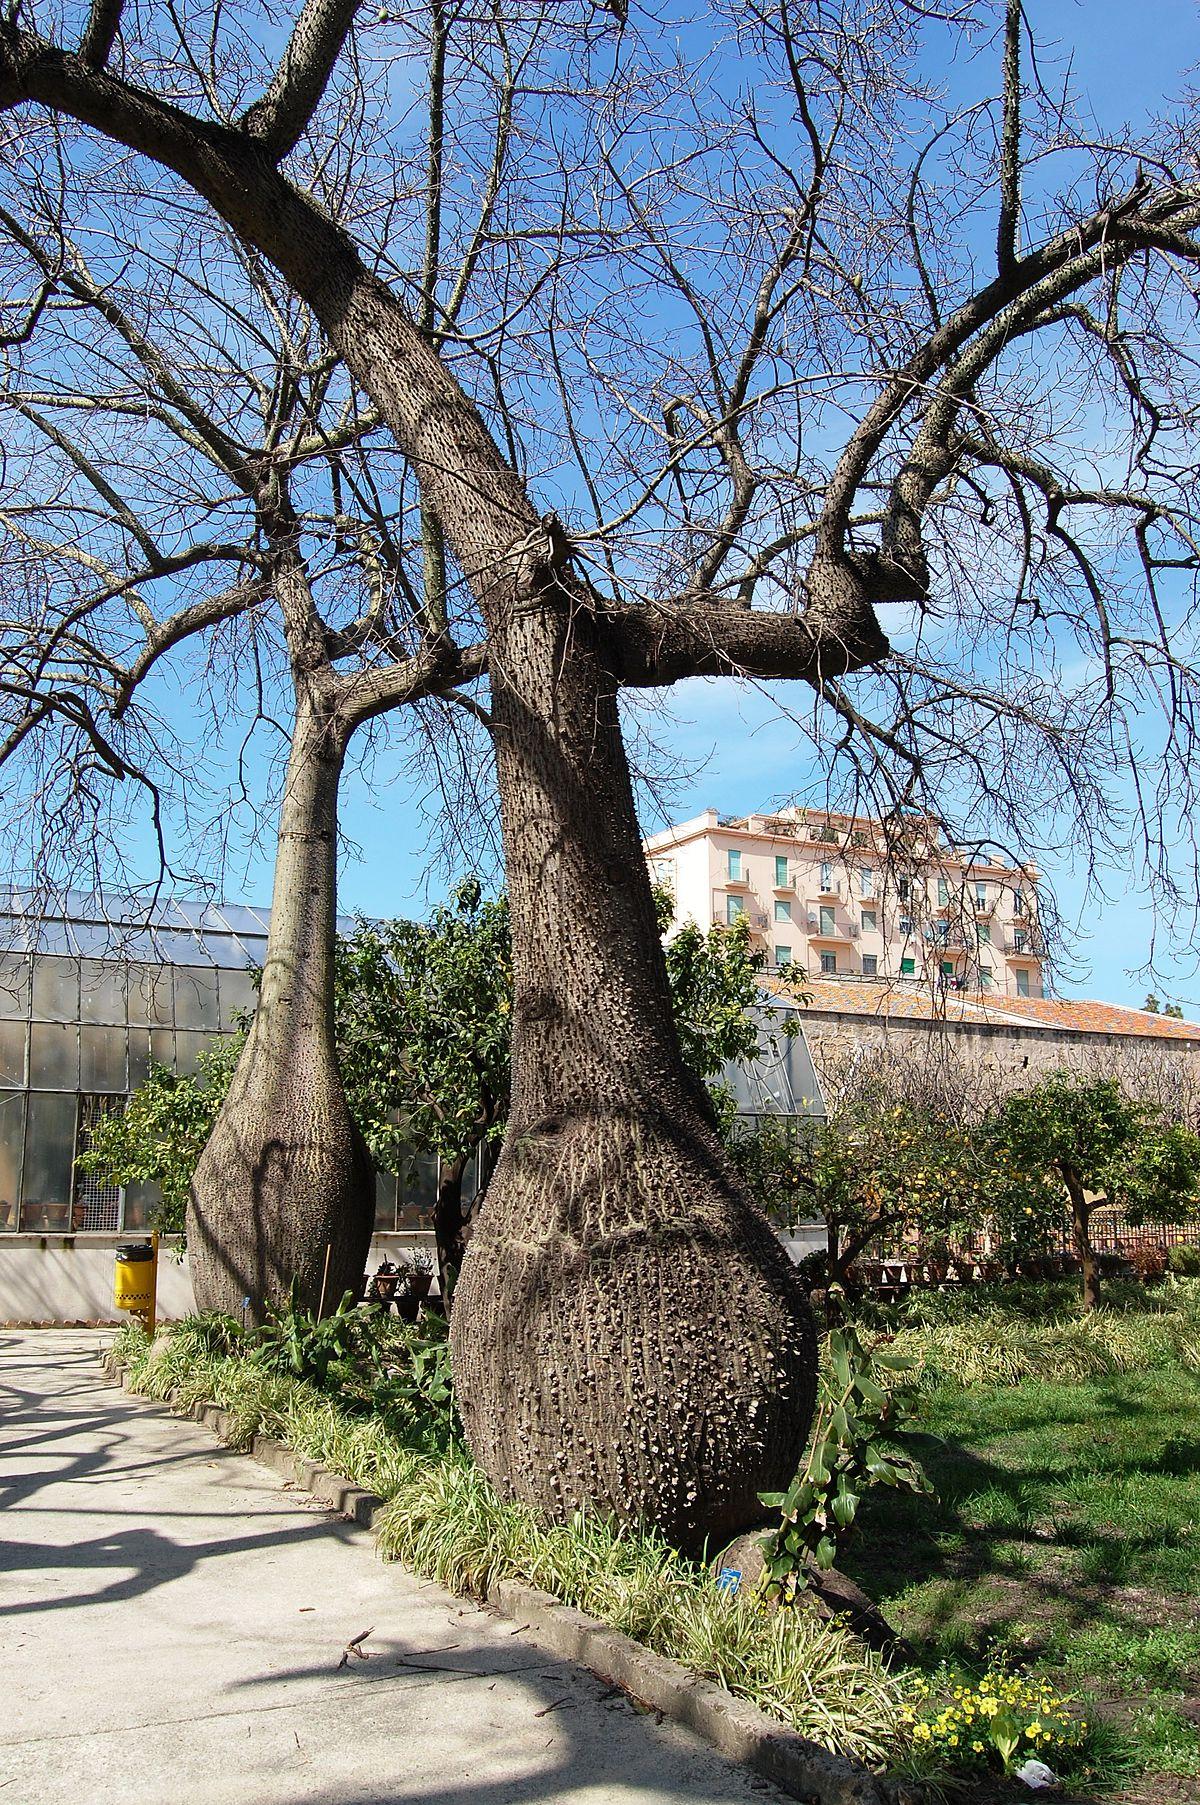 florettseidenbaum – wikipedia